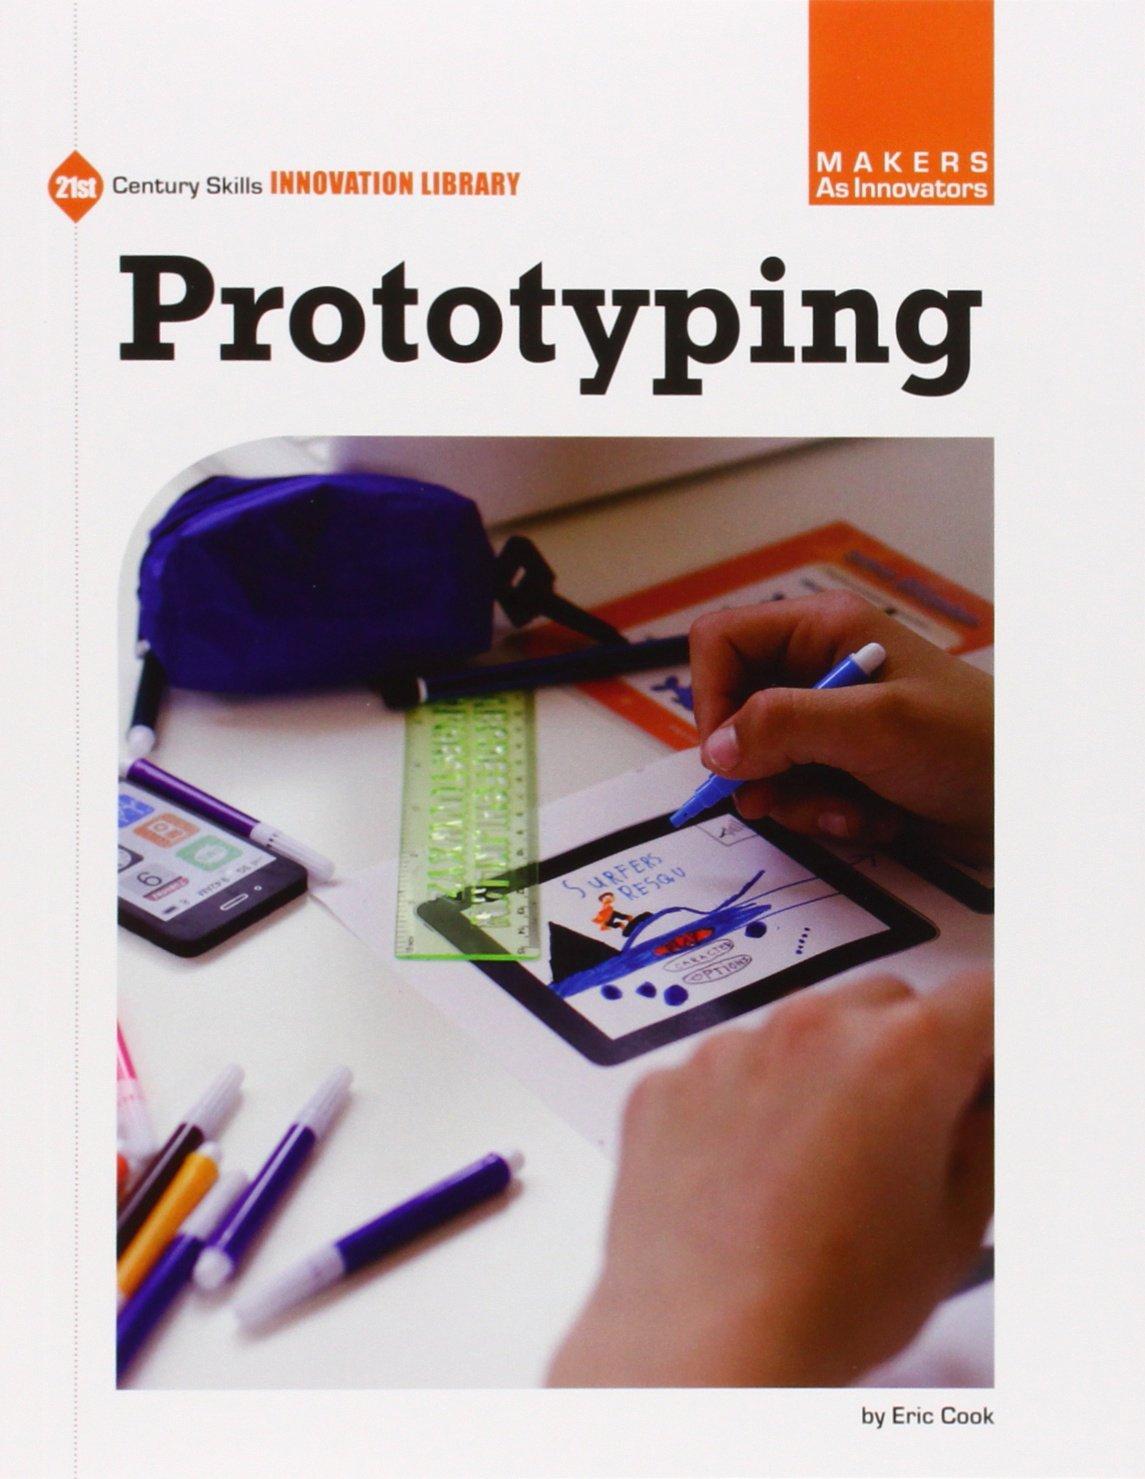 Prototyping (21st Century Skills Innovation Library: Makers as Innovators)